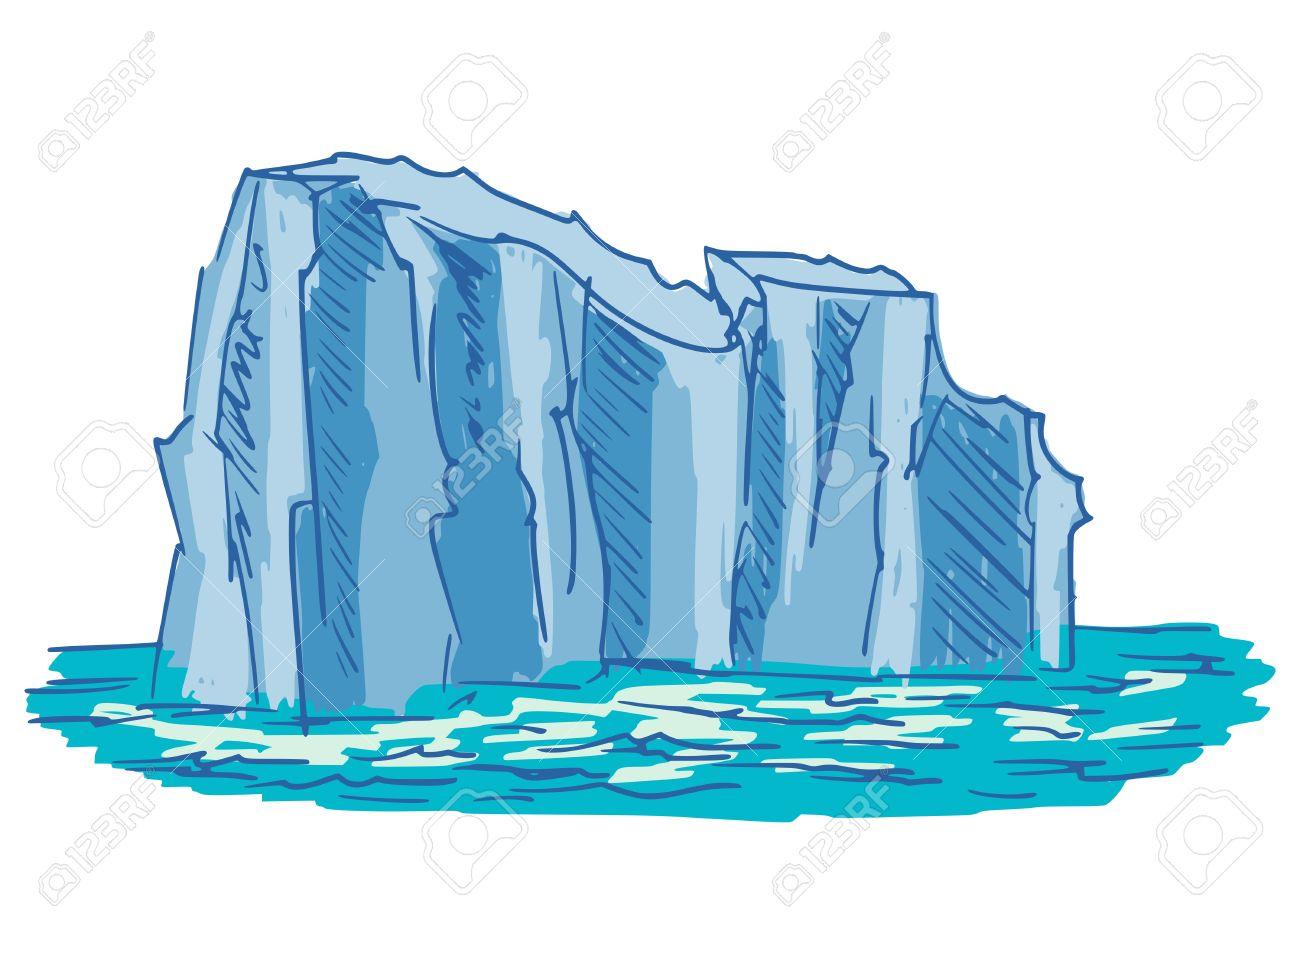 hand drawn, cartoon, sketch illustration of iceberg Stock Vector - 24892575